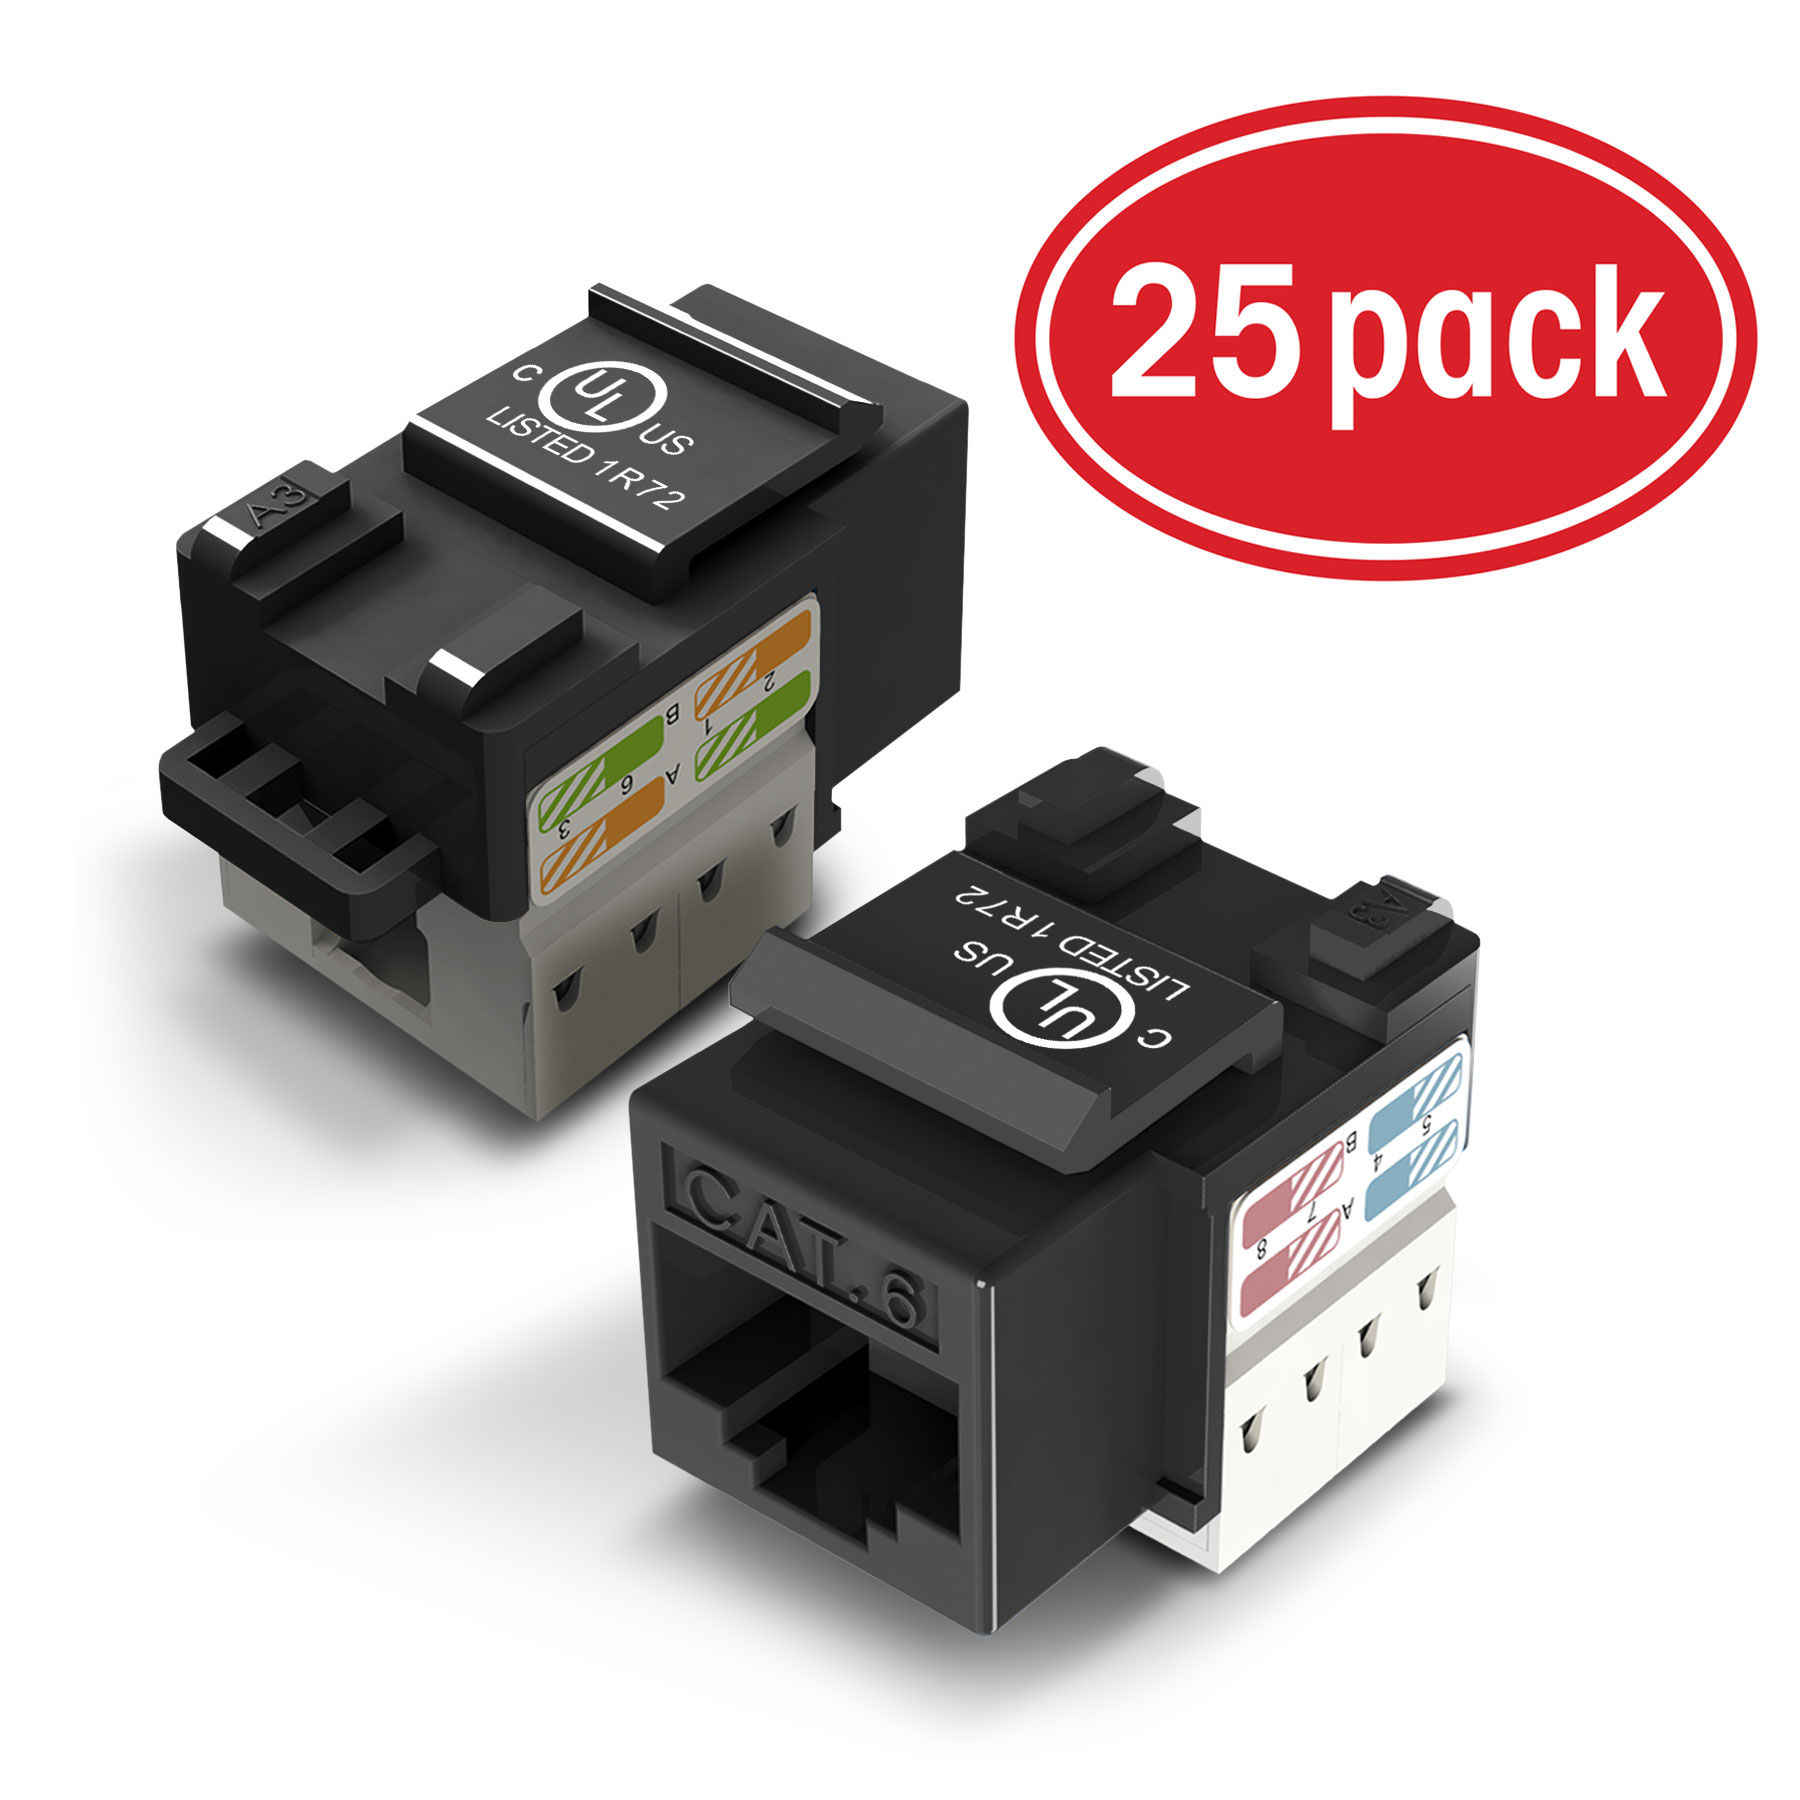 hight resolution of 25 pack ethernet keystone gearit cat6 rj45 punch down keystone jack connector black walmart com